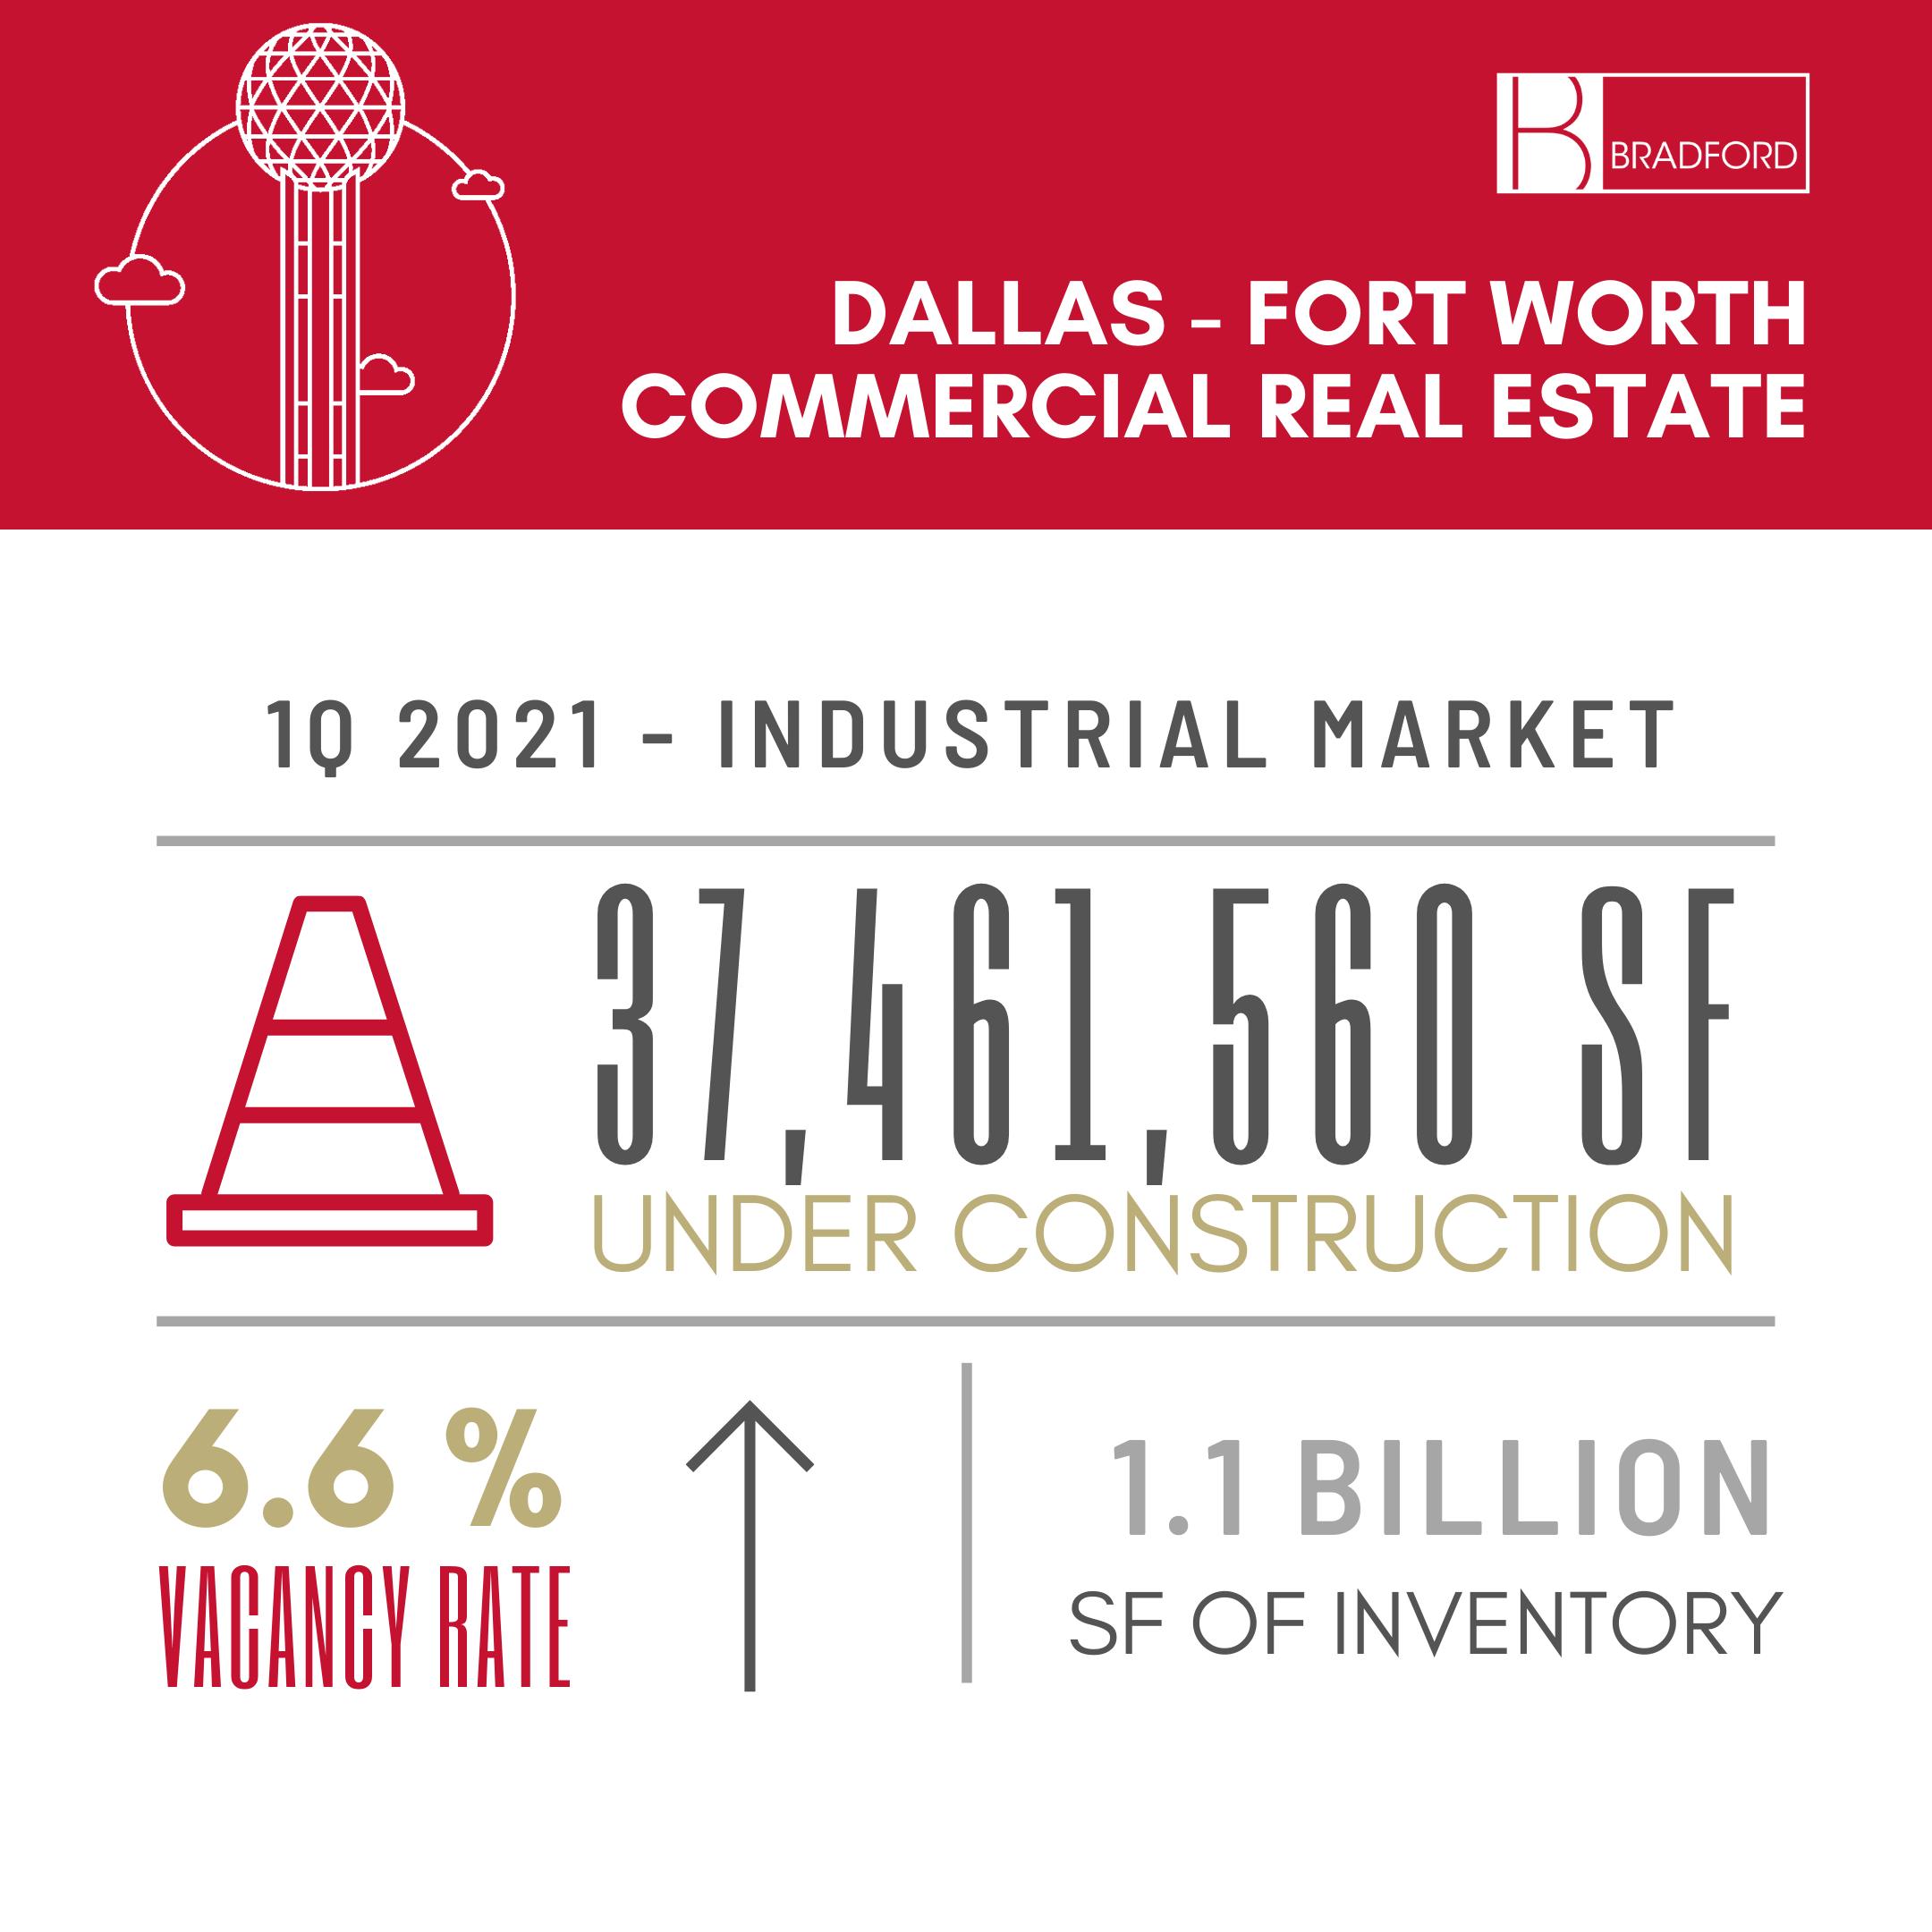 DFW Industrial Market 1Q 2021